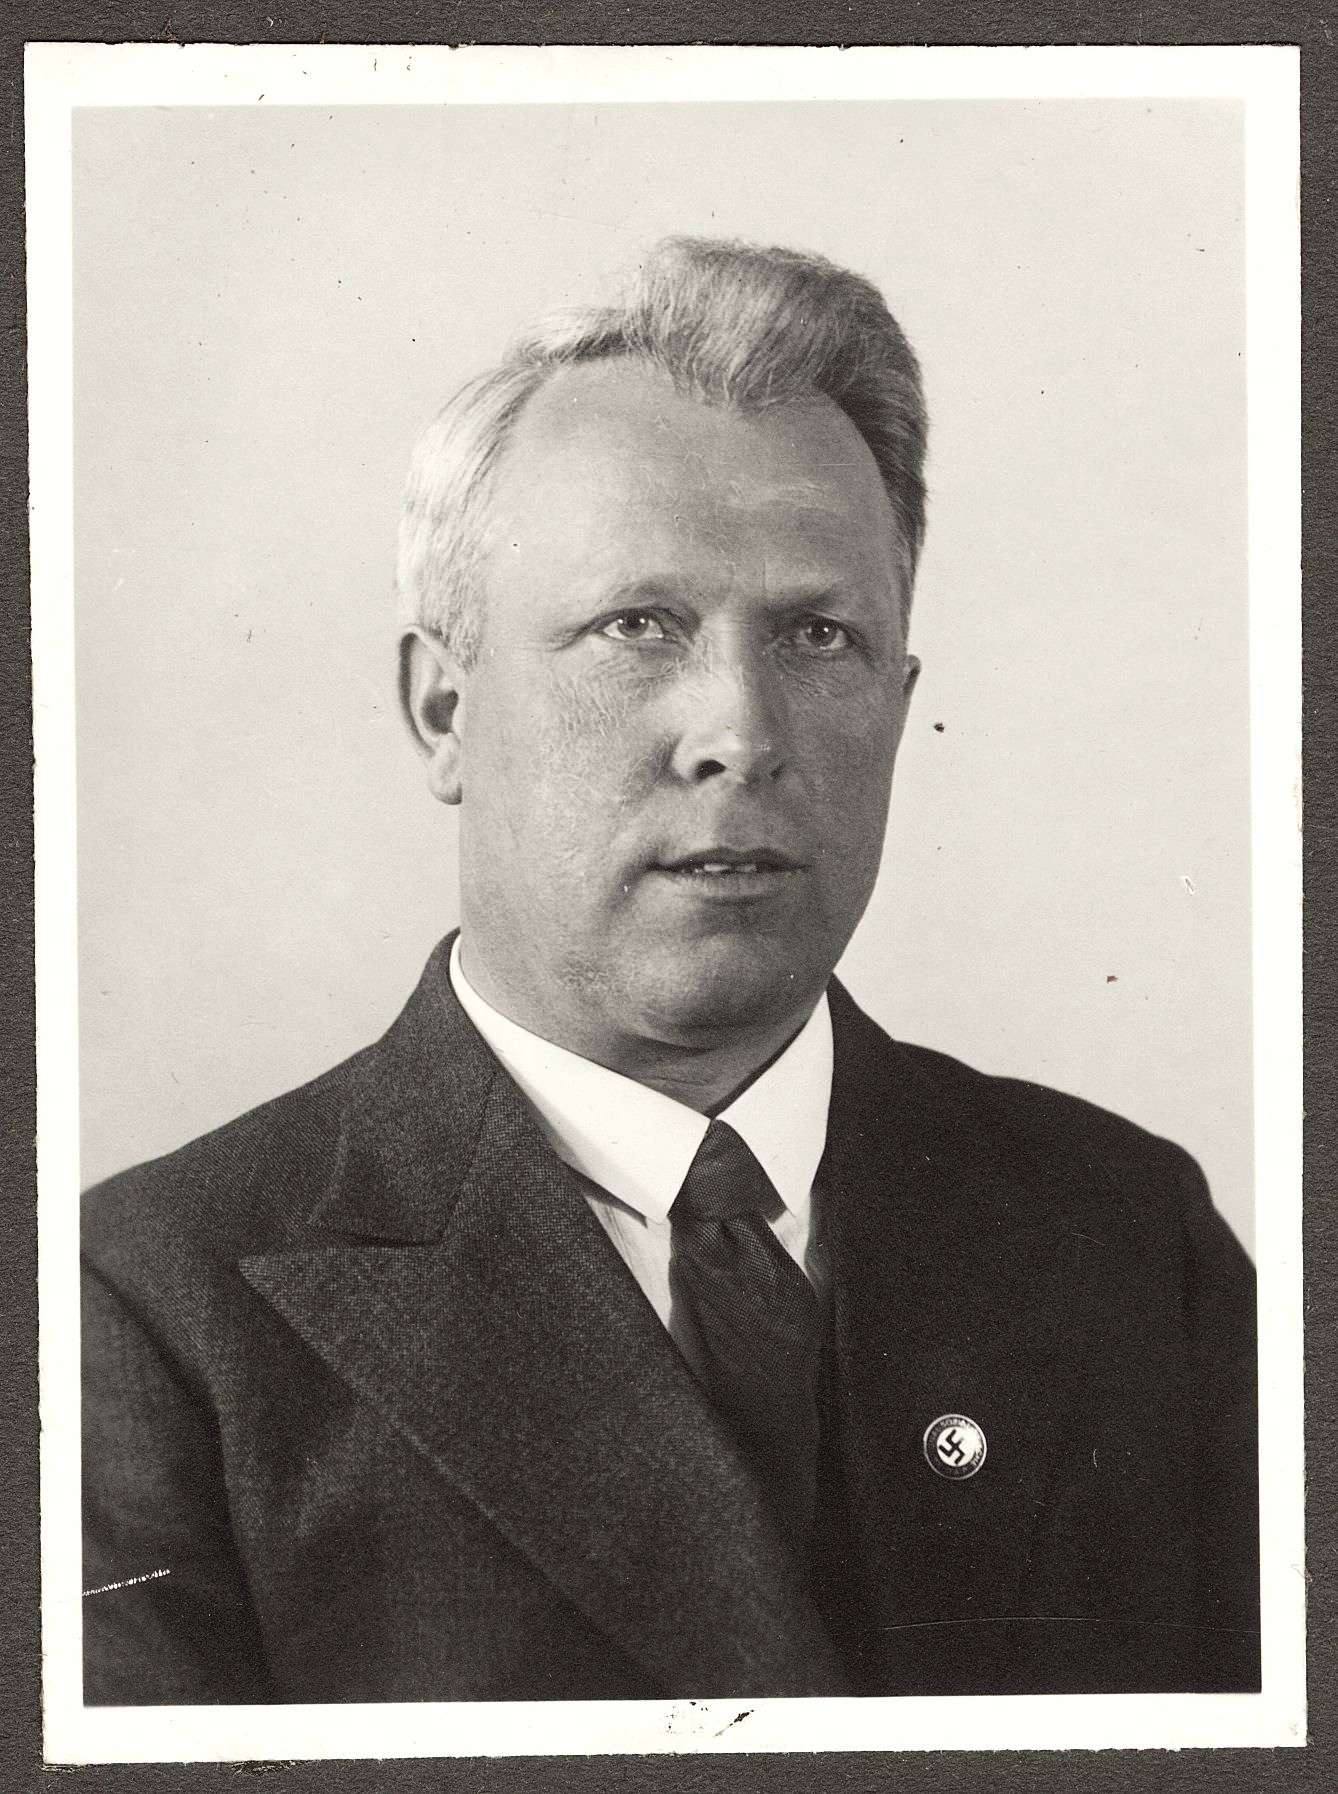 Geißlinger, Leonhard, Bild 1